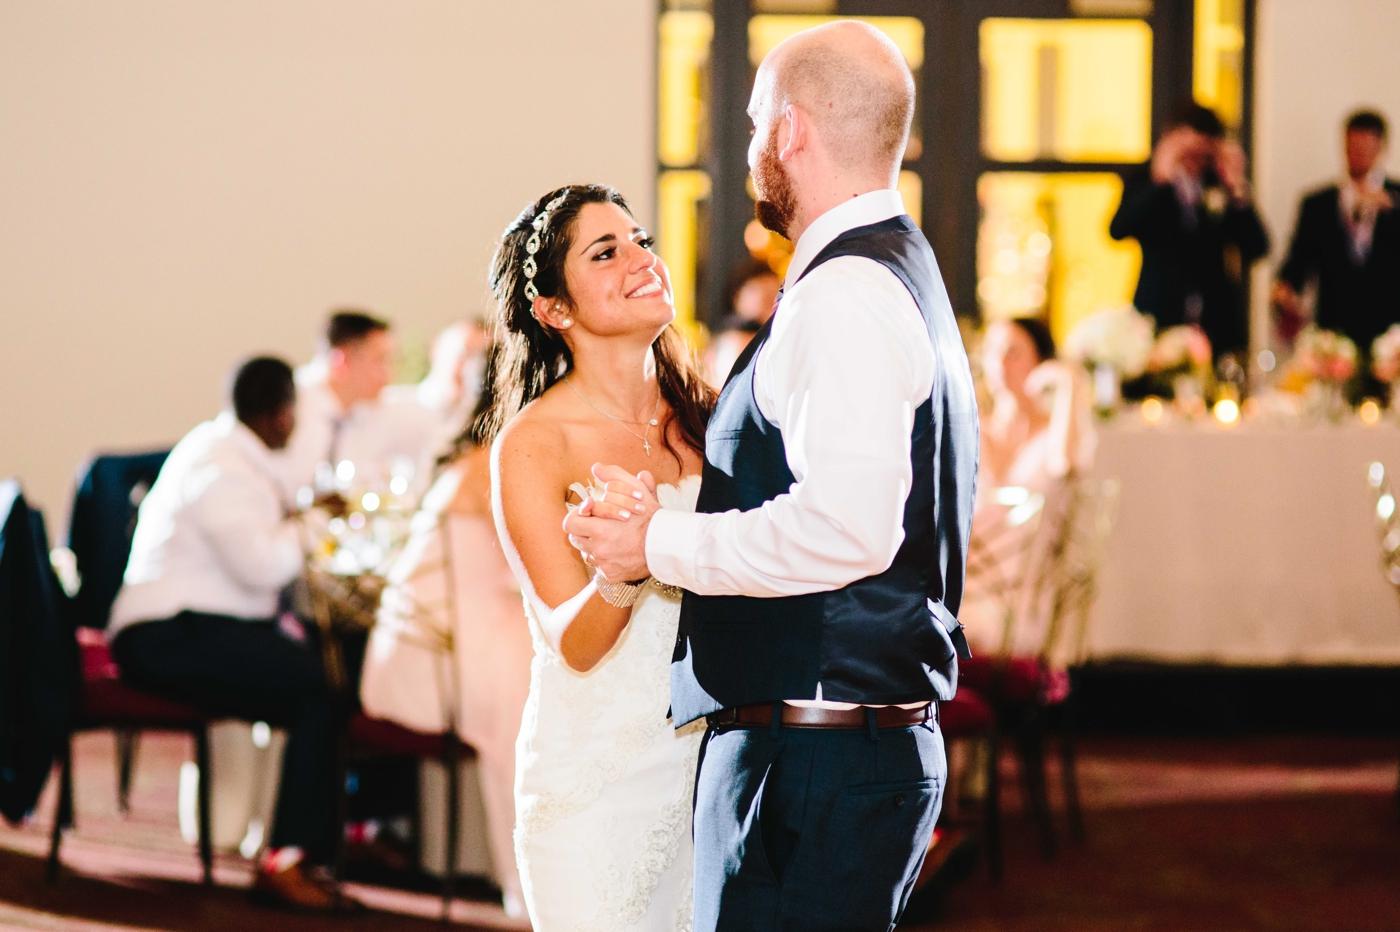 chicago-fine-art-wedding-photography-svihra23